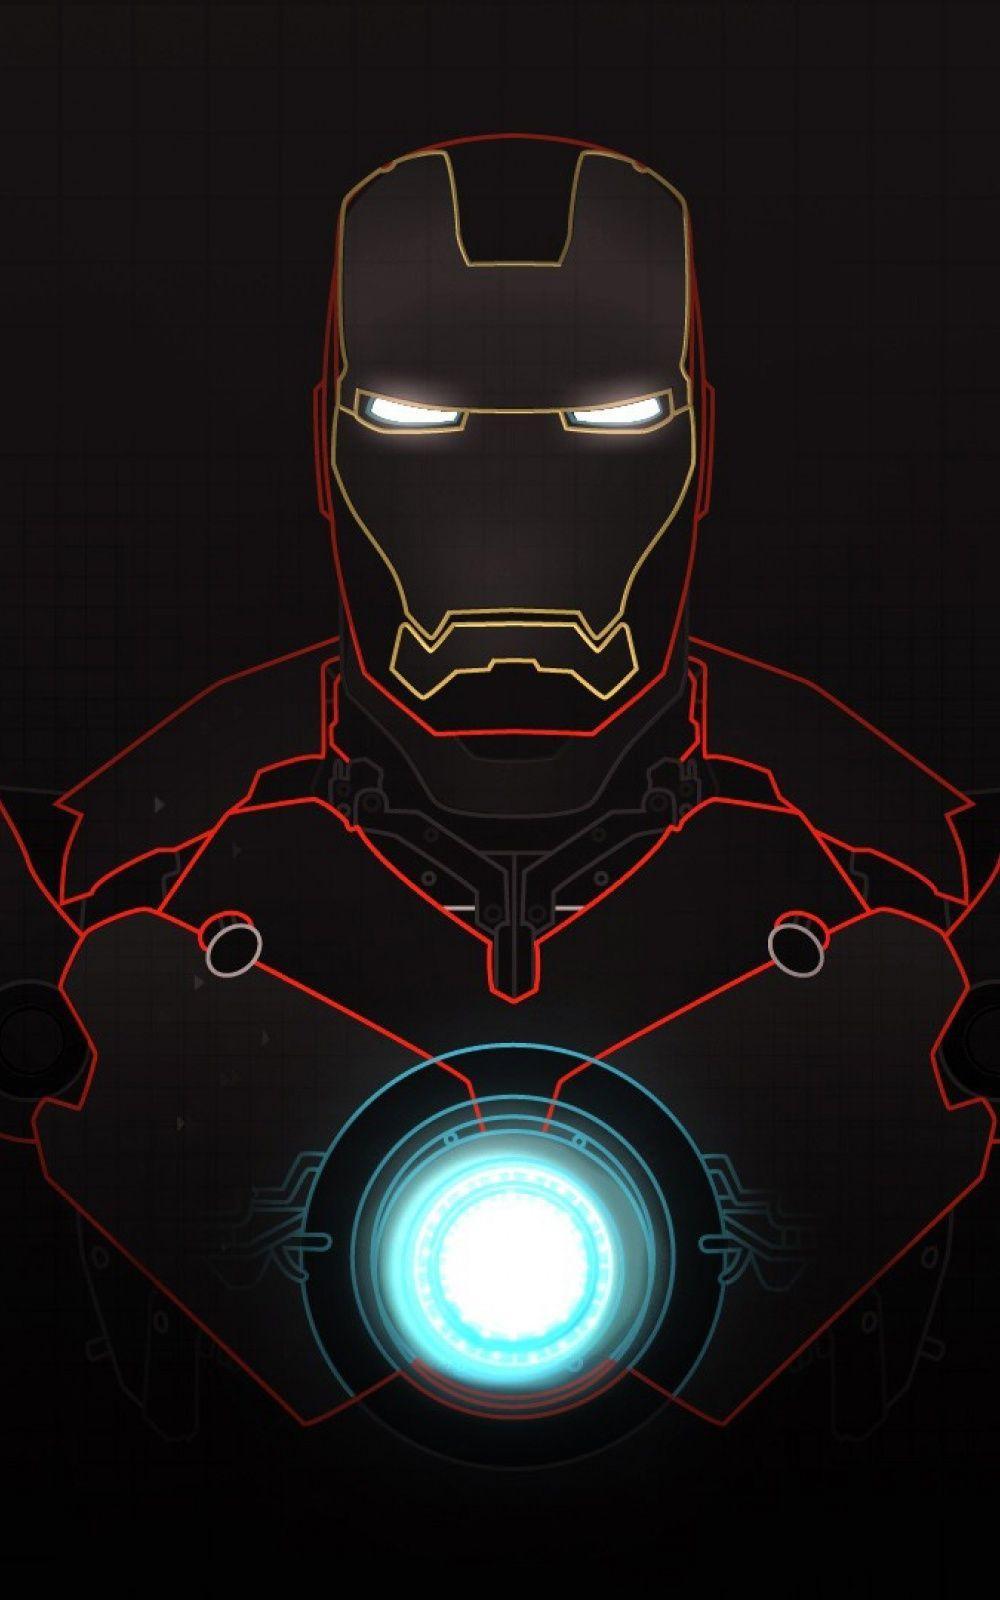 Iron Man Iphone Wallpapers Top Free Iron Man Iphone Backgrounds